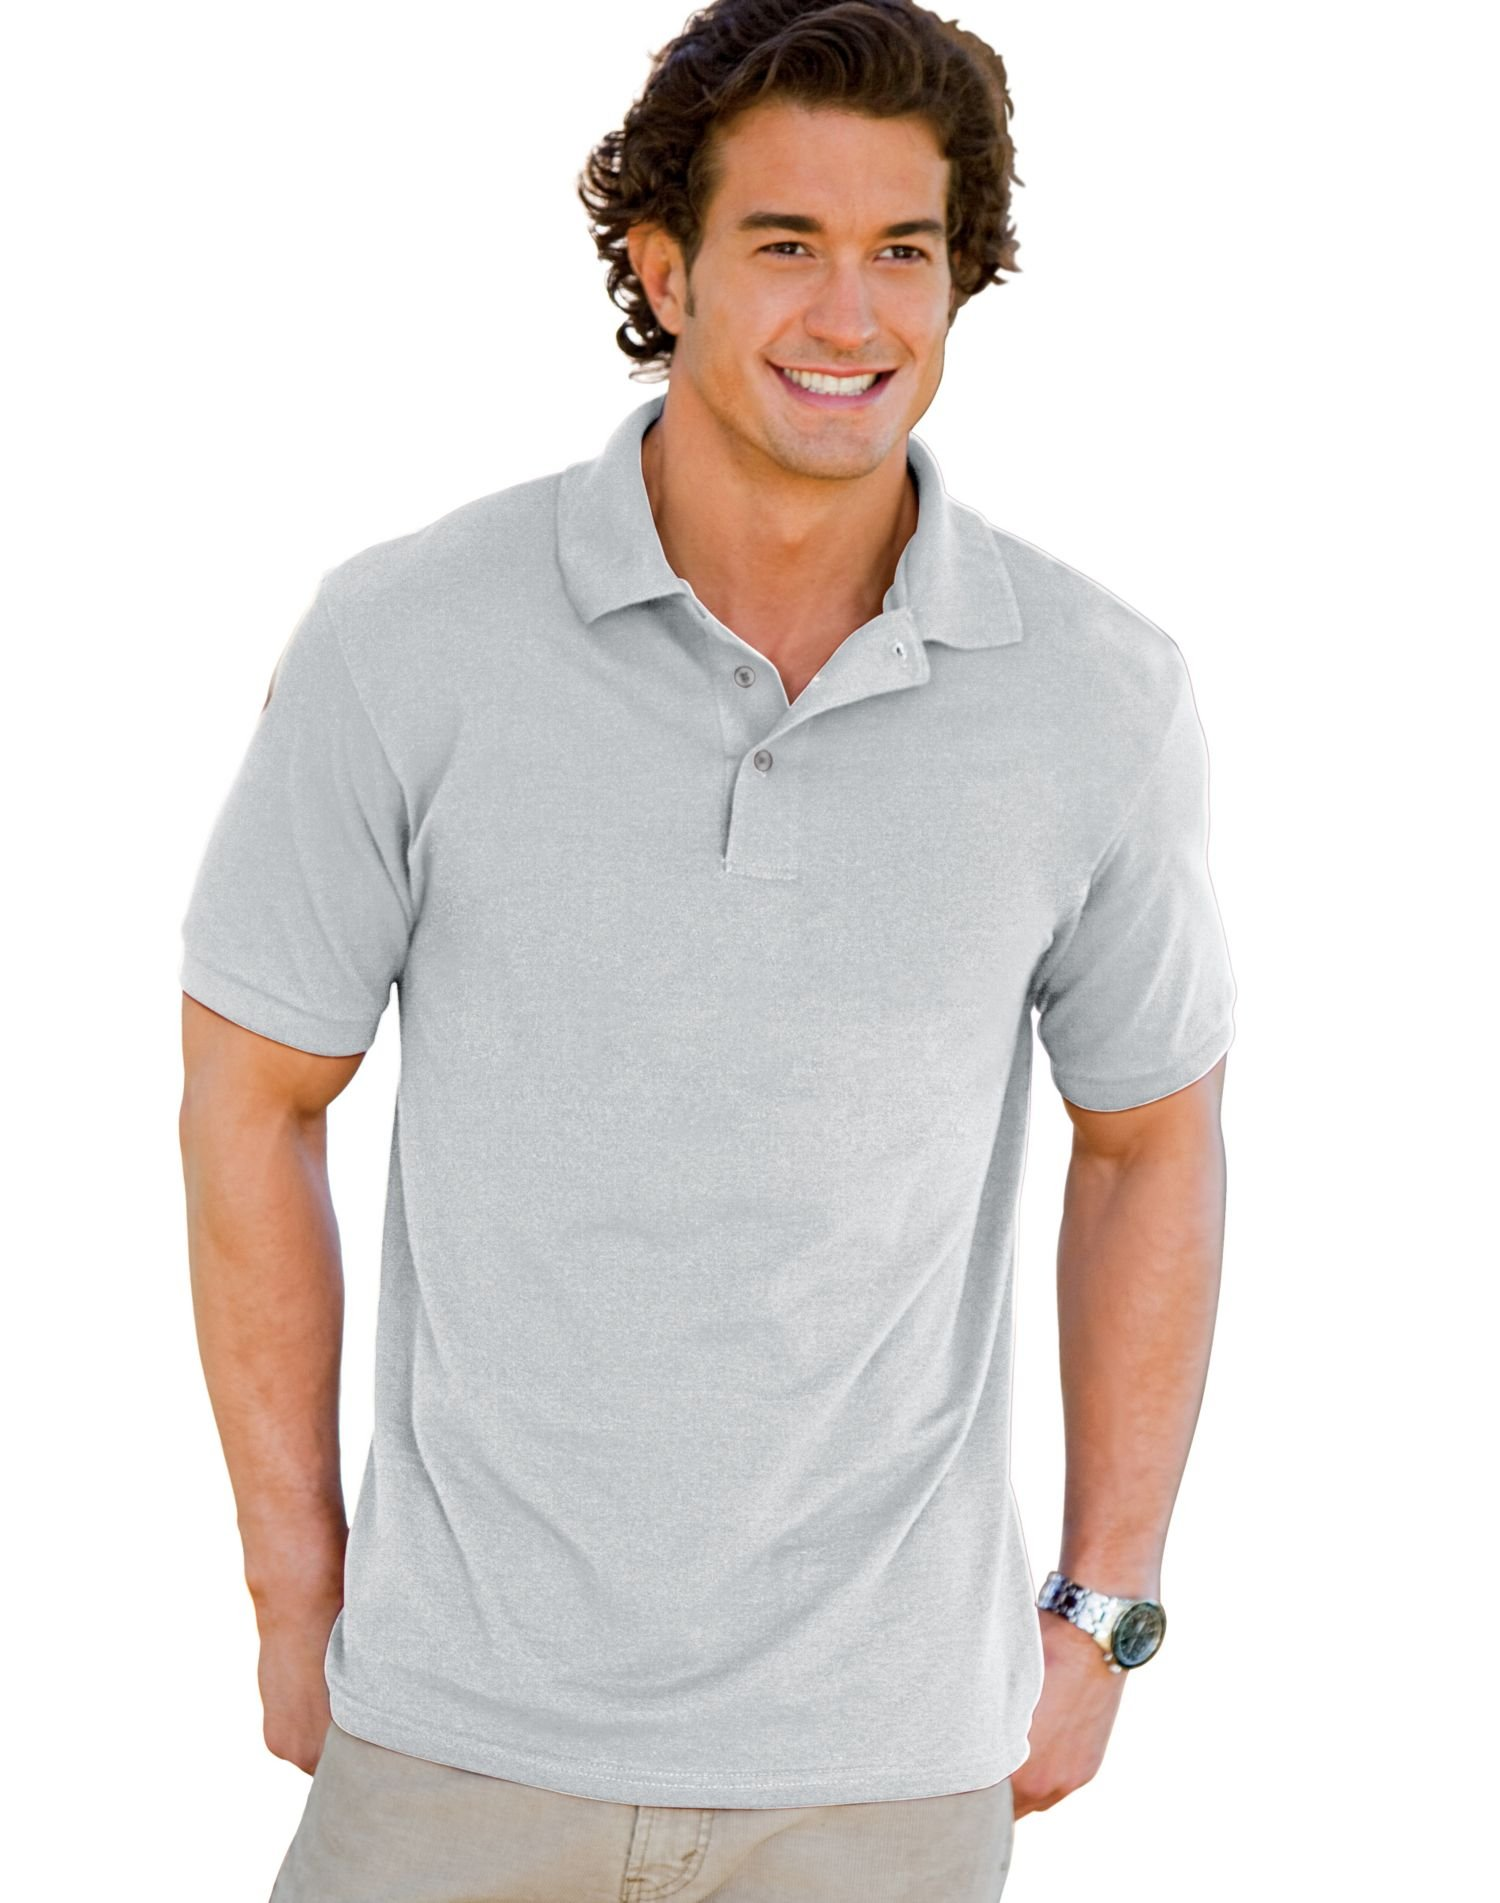 Men's 7 oz Hanes STEDMAN Cotton Pique Polo (XL ,color ash )